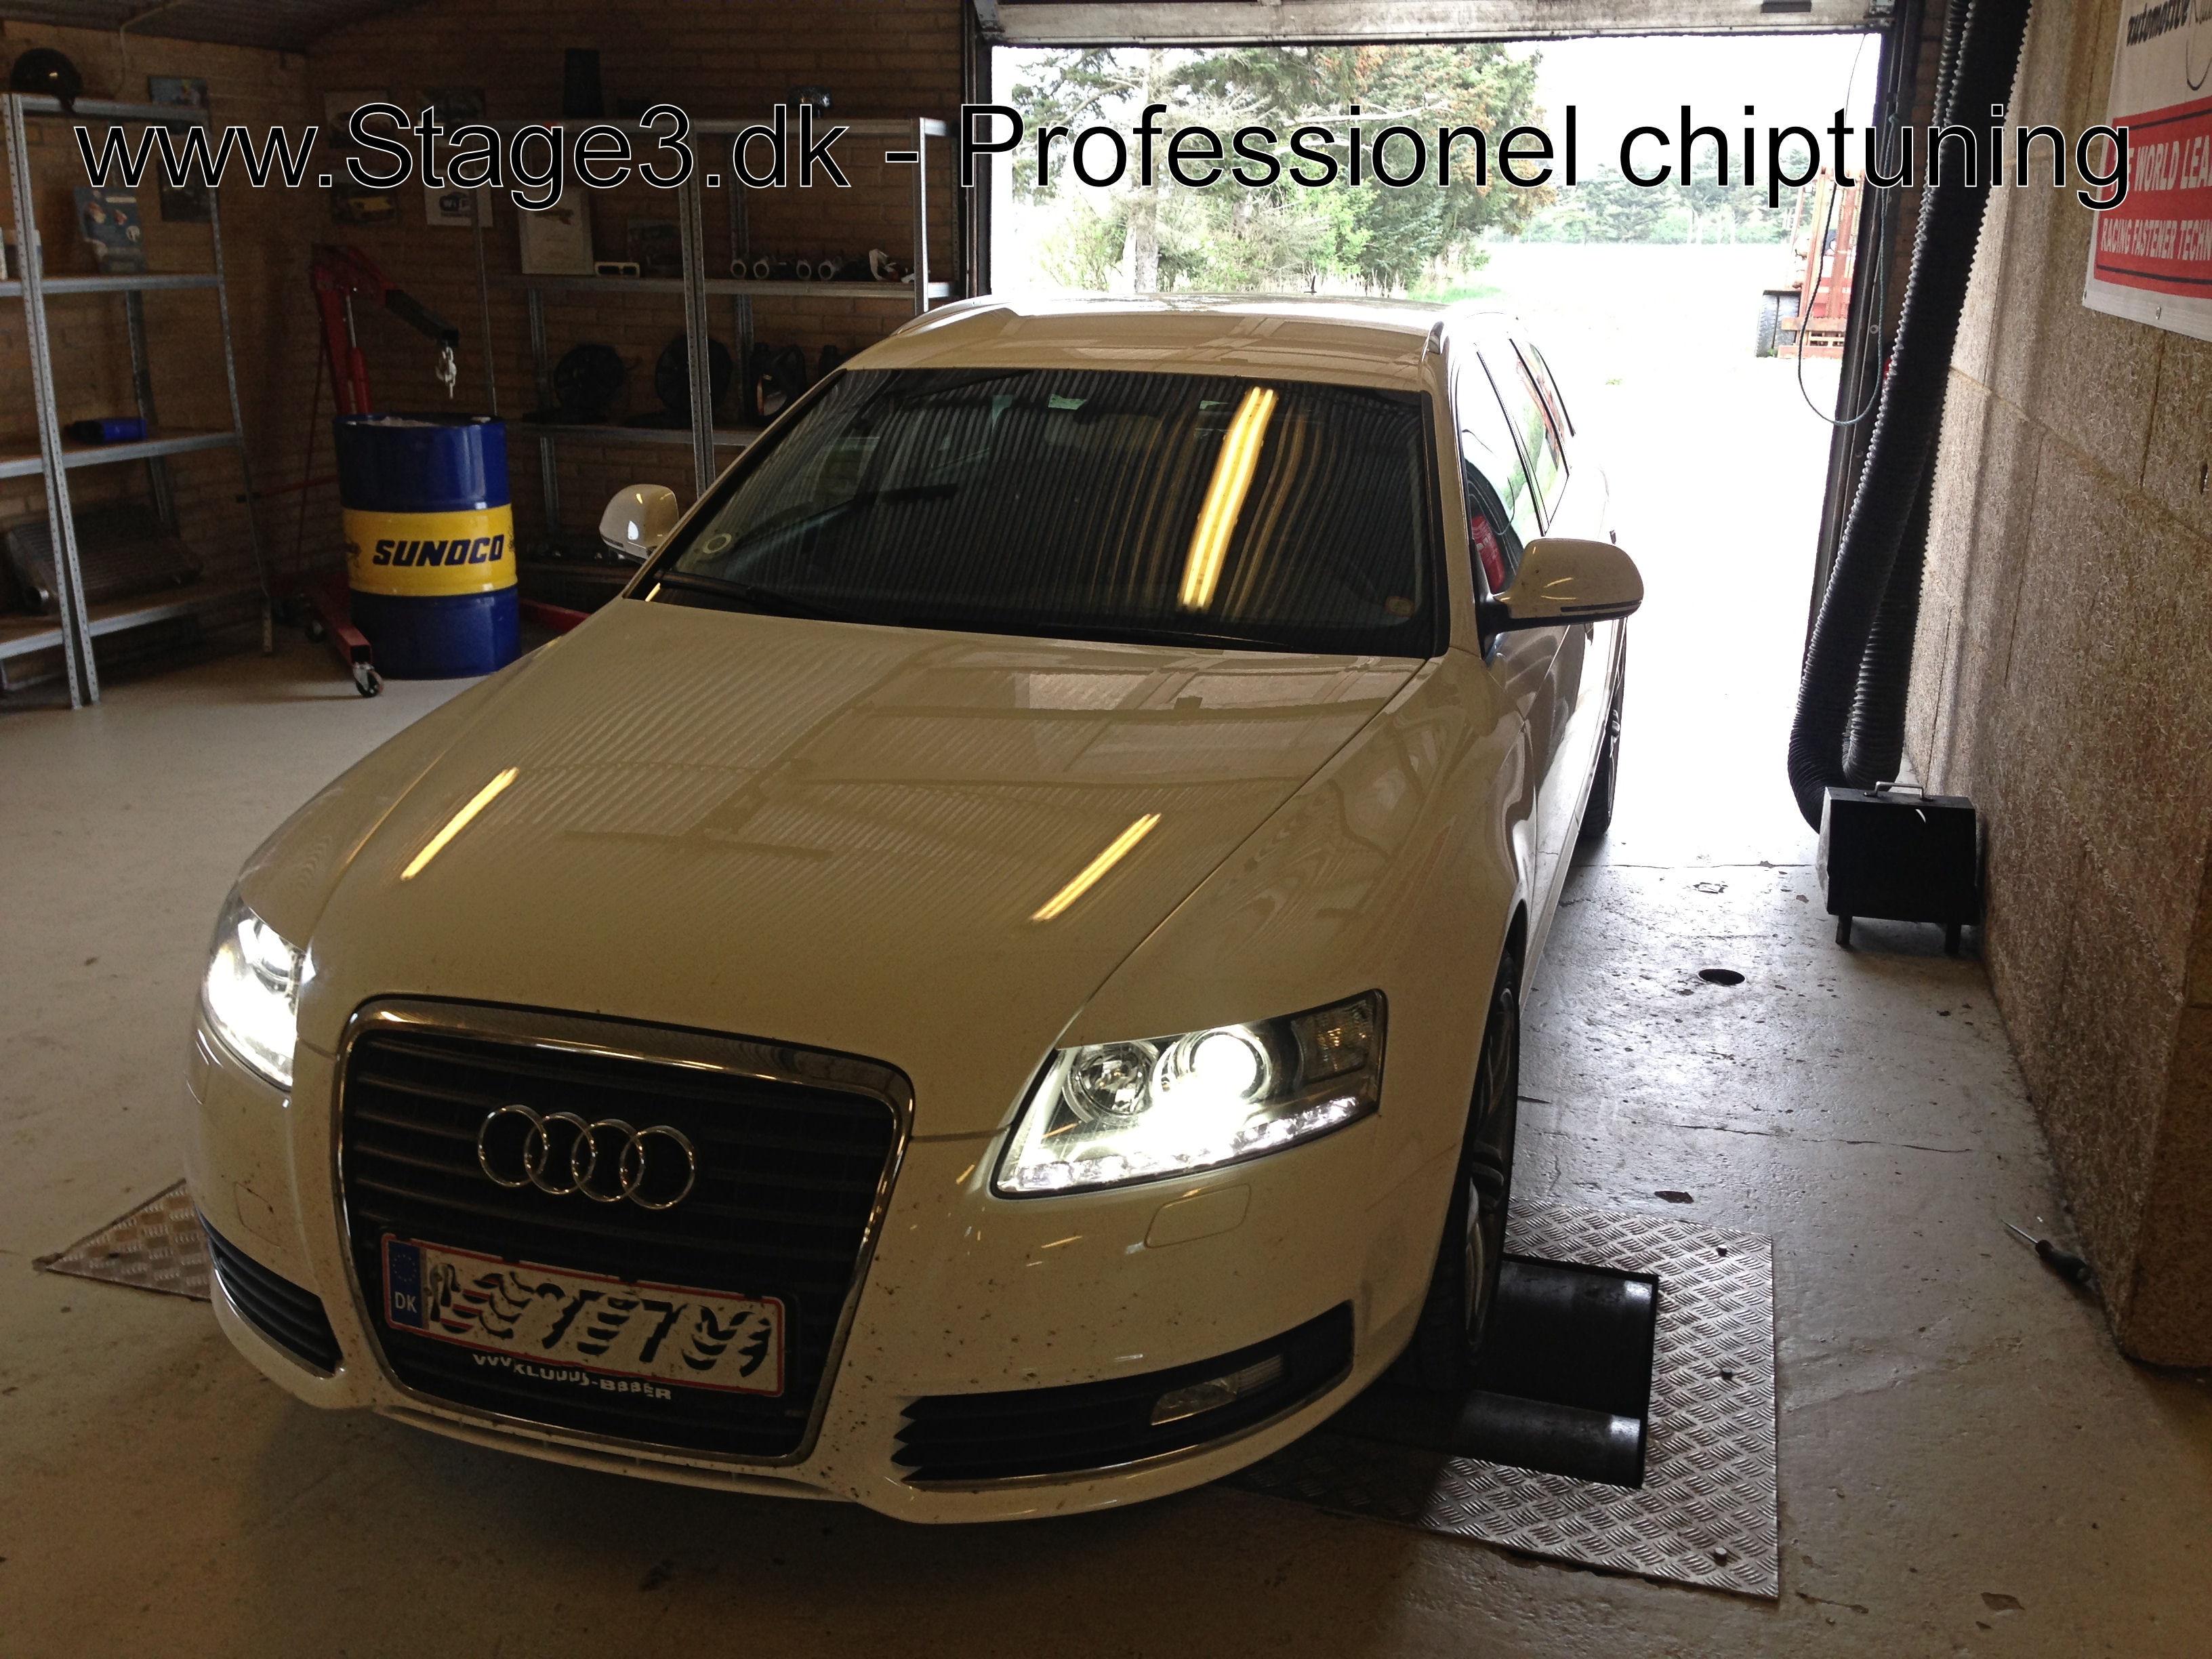 Audi A6 2.0 TDI chiptuning (4)